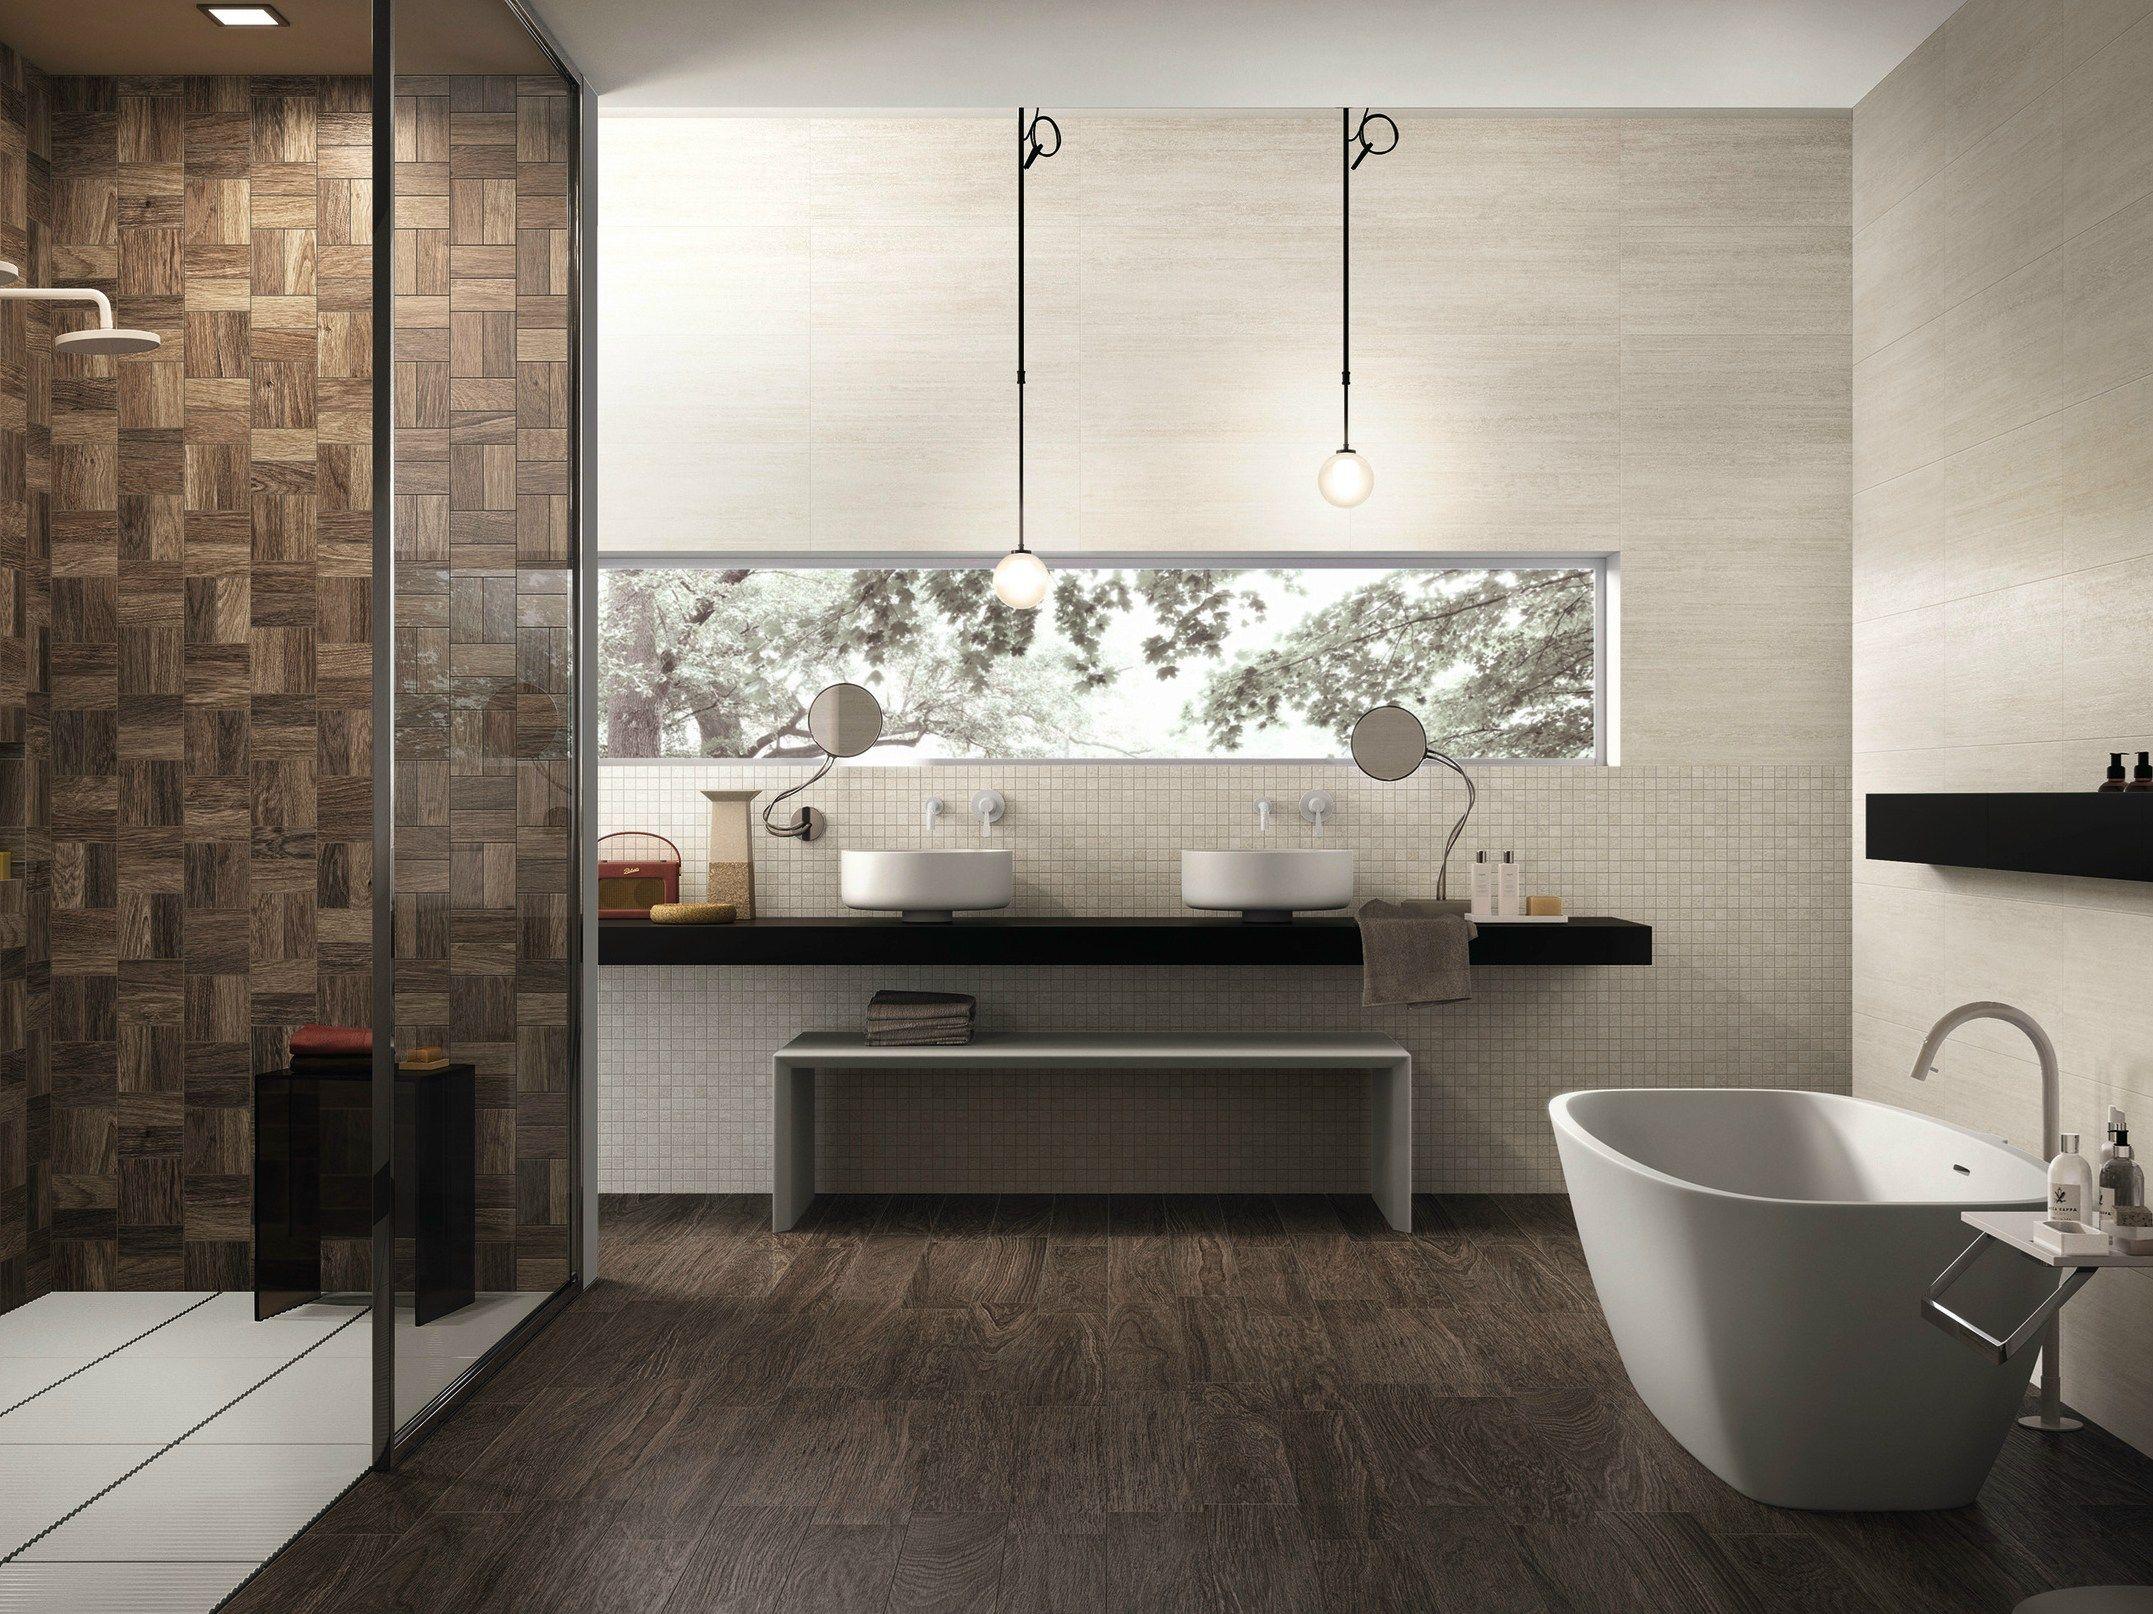 DUTCH Wall/floor tiles by CERAMICA SANT'AGOSTINO